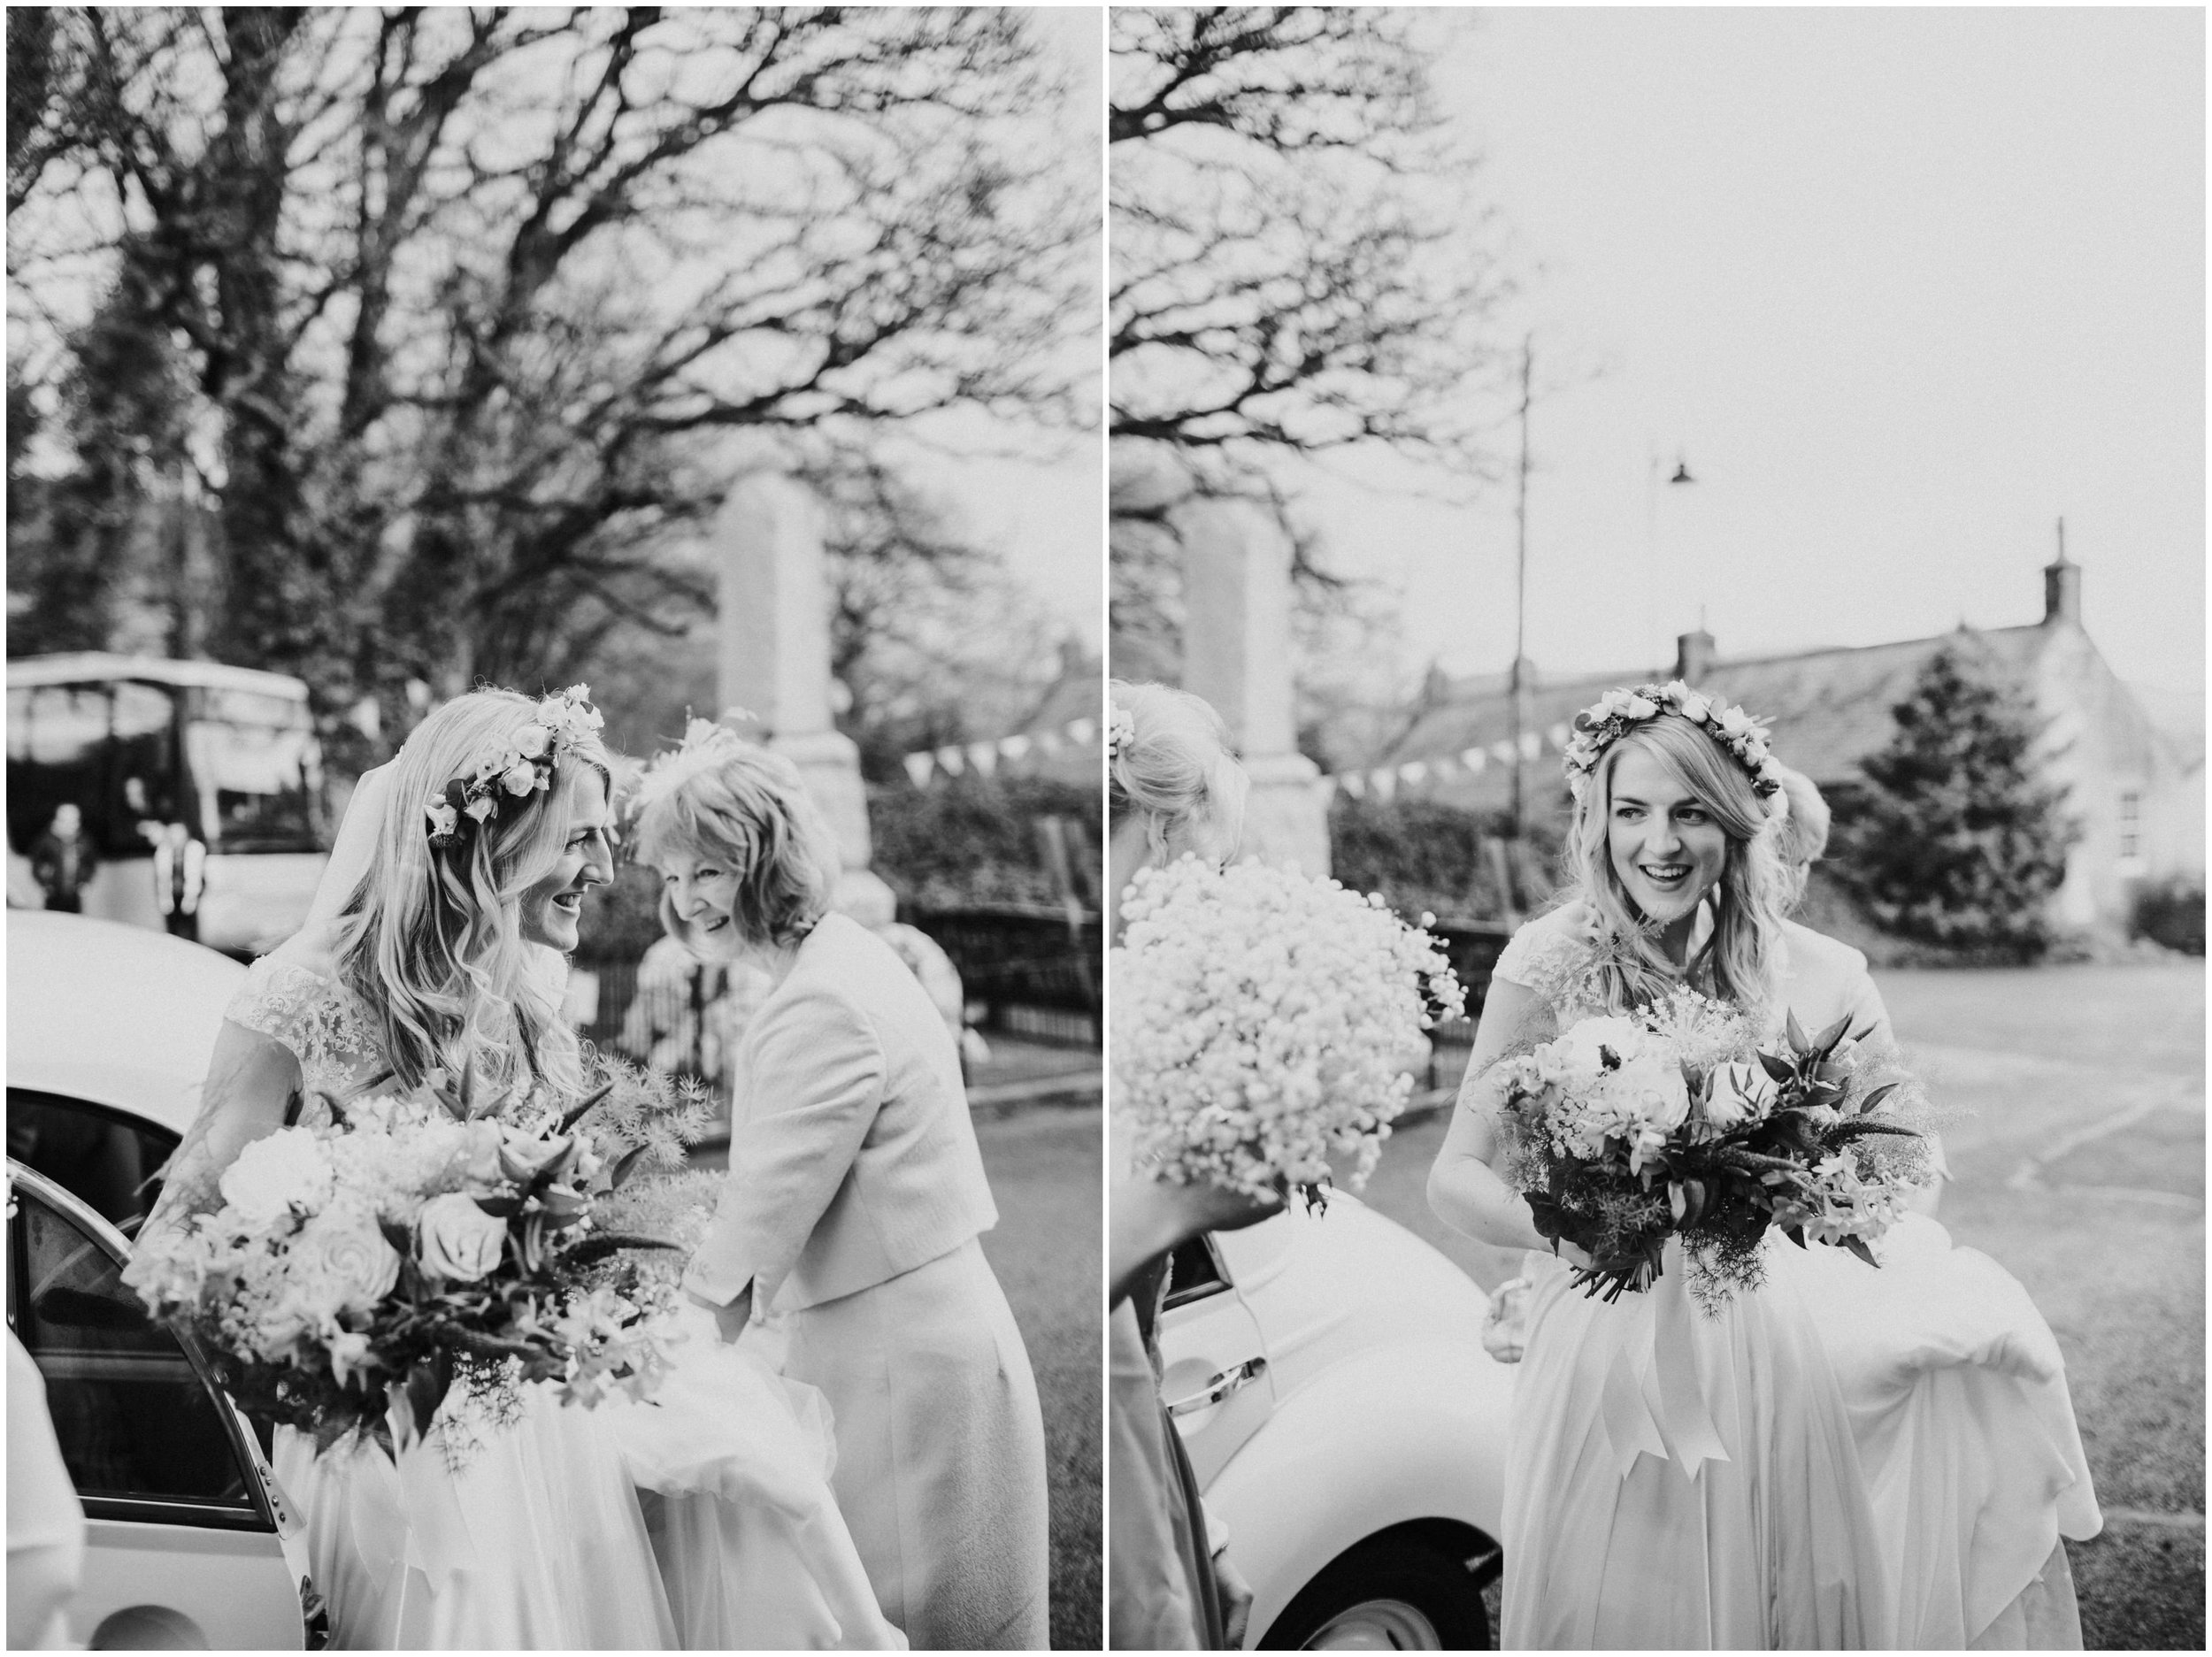 Photography 78 - Glasgow Wedding Photographer - Dave & Alana_0028.jpg